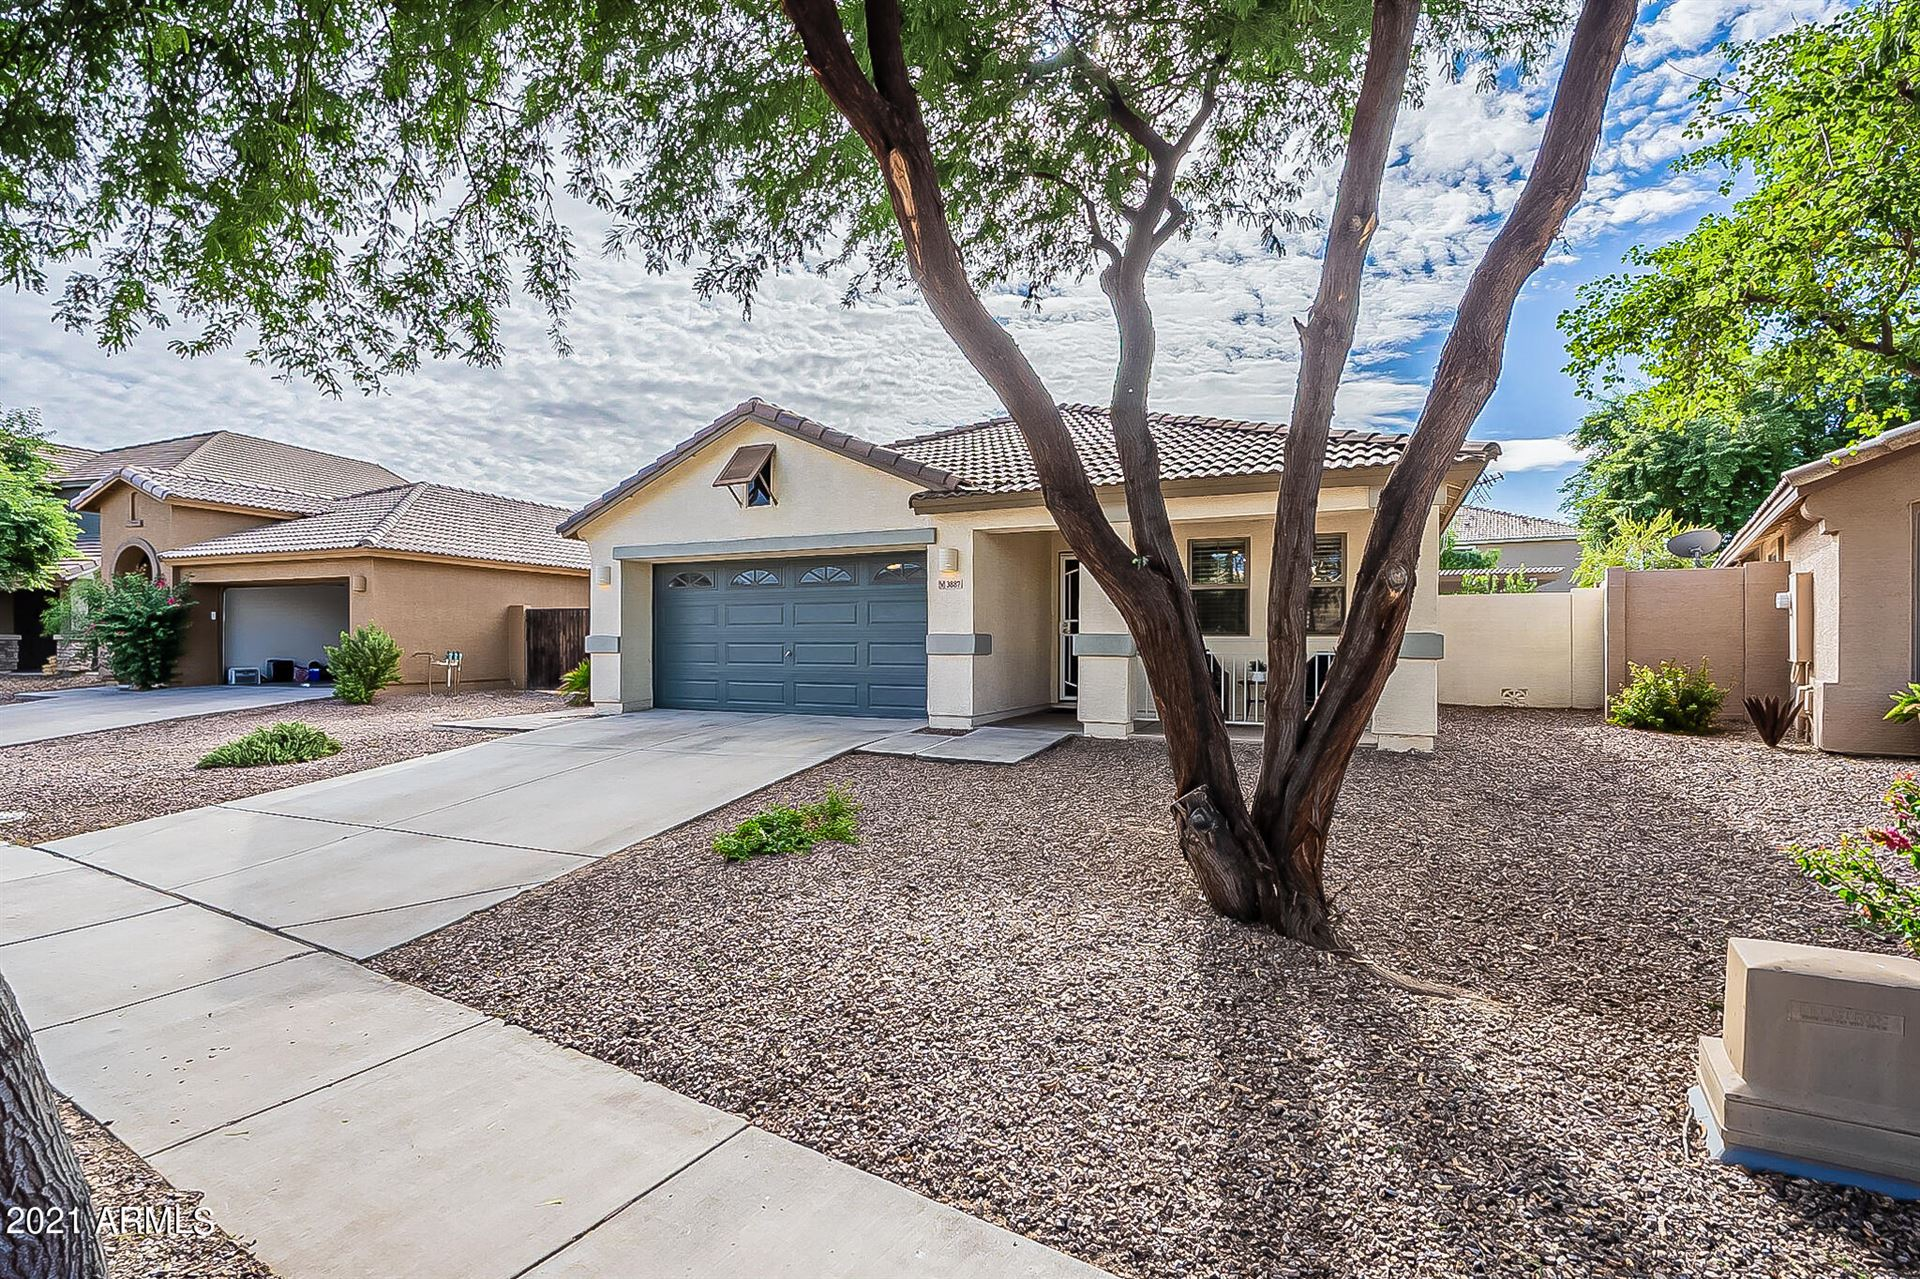 Photo of 3887 E CLOUDBURST Drive, Gilbert, AZ 85297 (MLS # 6306209)